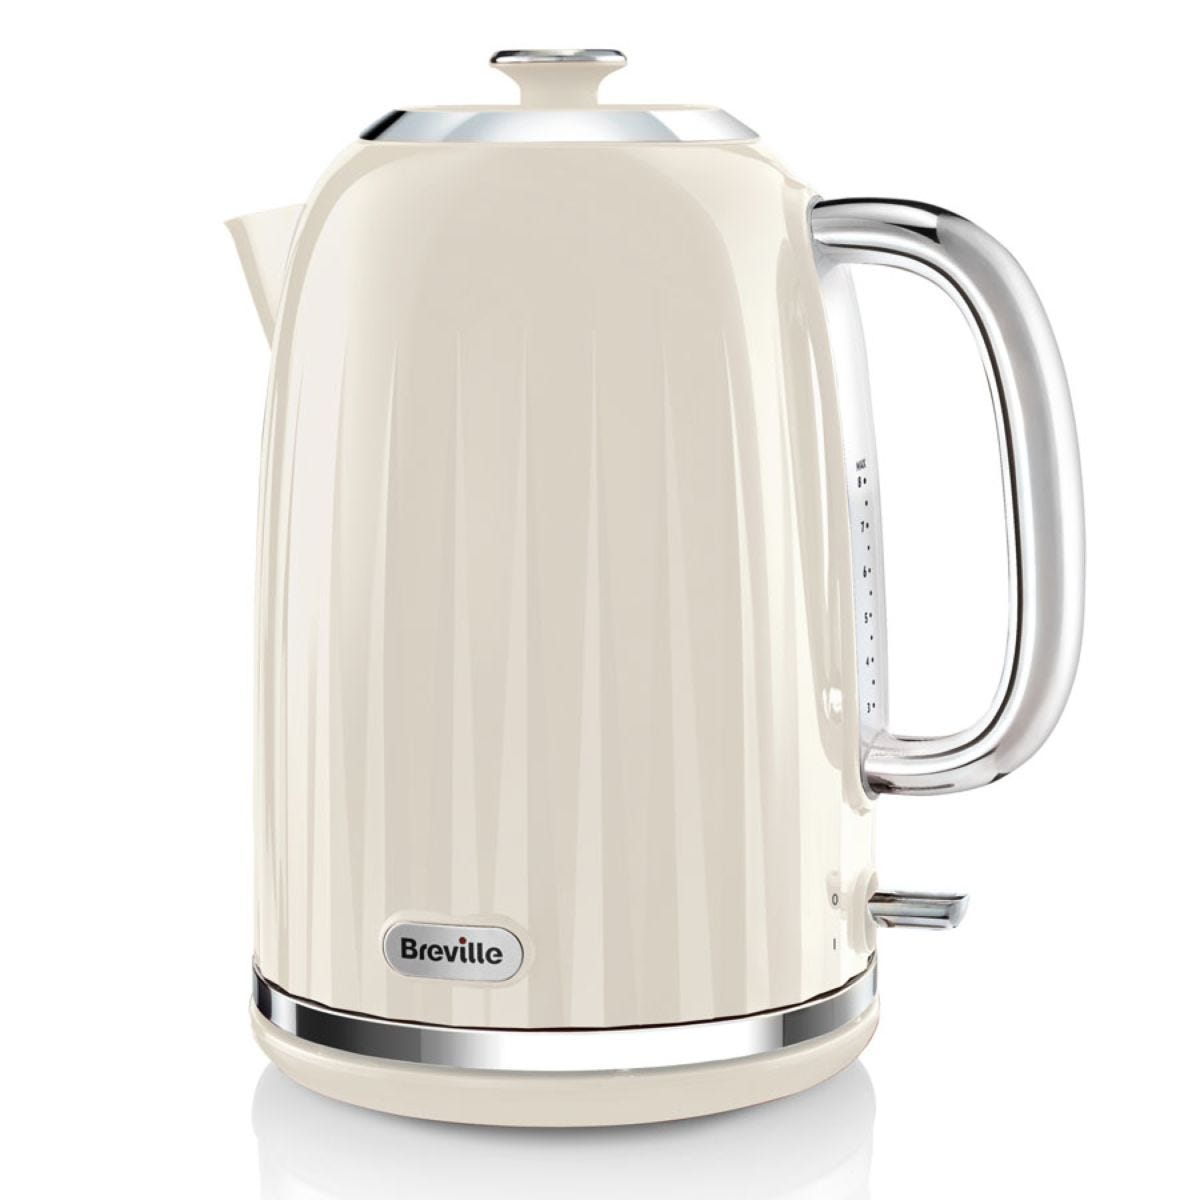 Breville VKJ956 Impressions 1.7L Cordless Fast Boil 3000W Jug Kettle - Cream